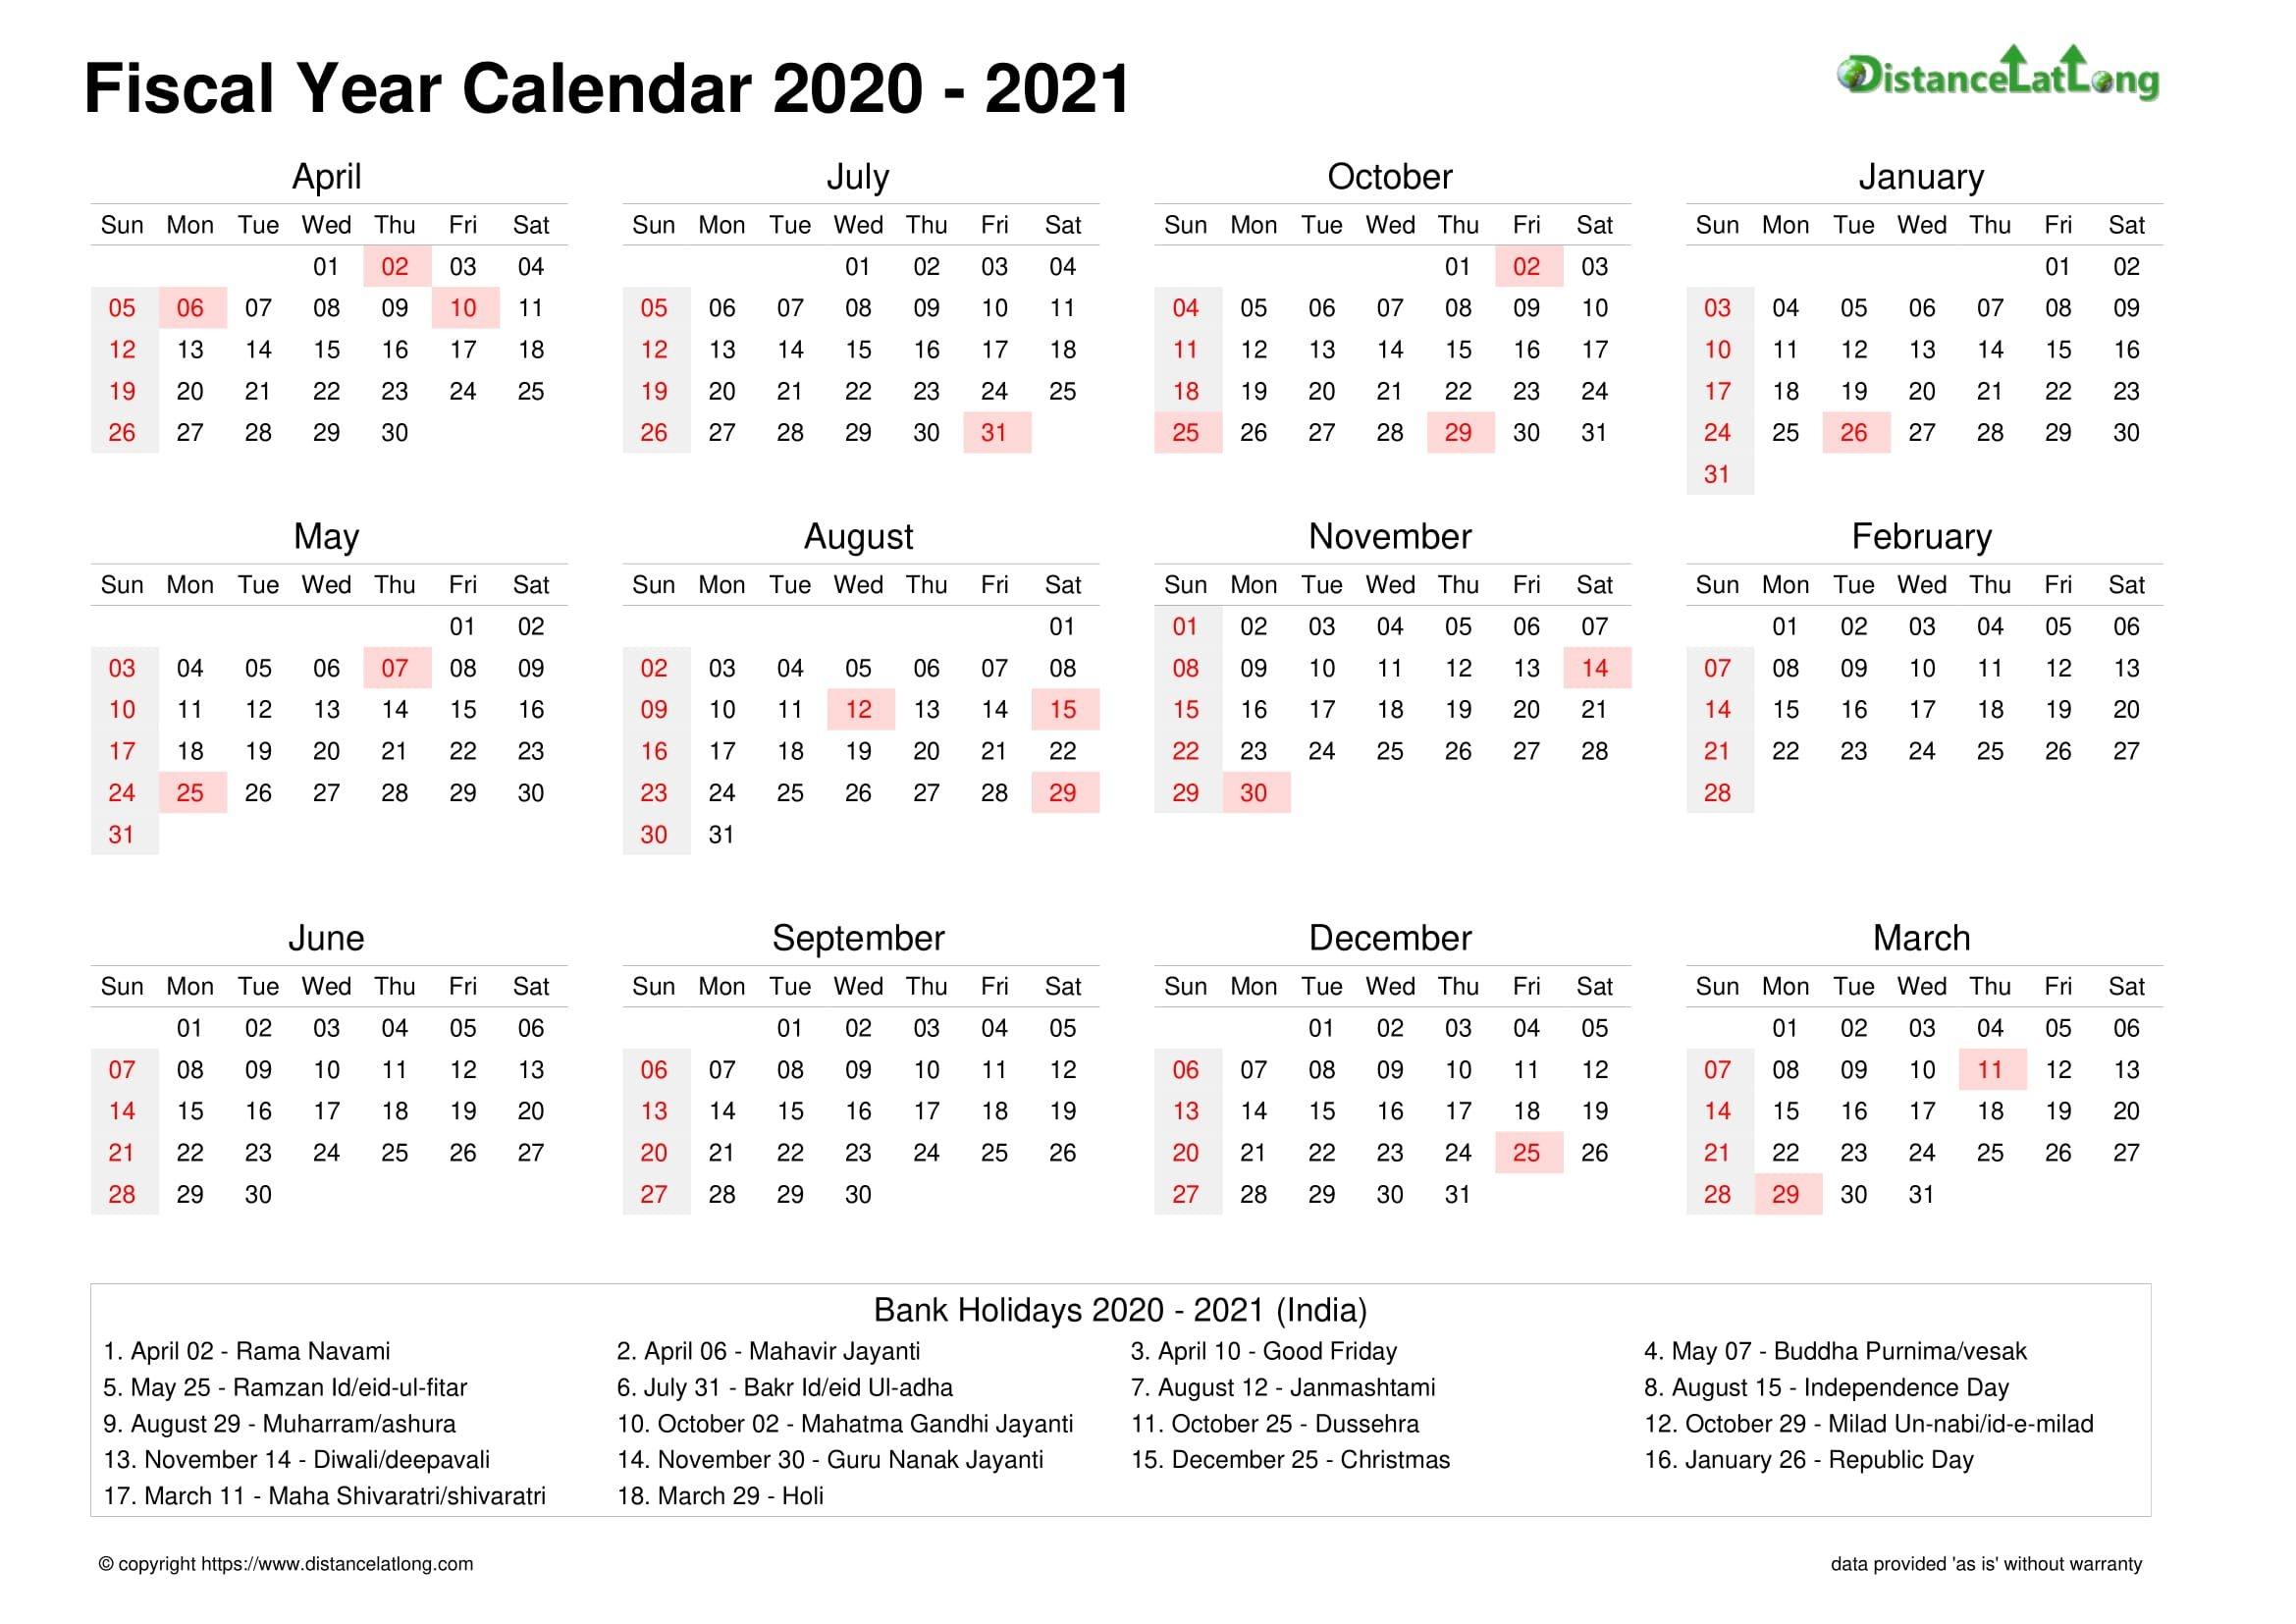 Fiscal Landscape Calendar Vertical Month Week Covered